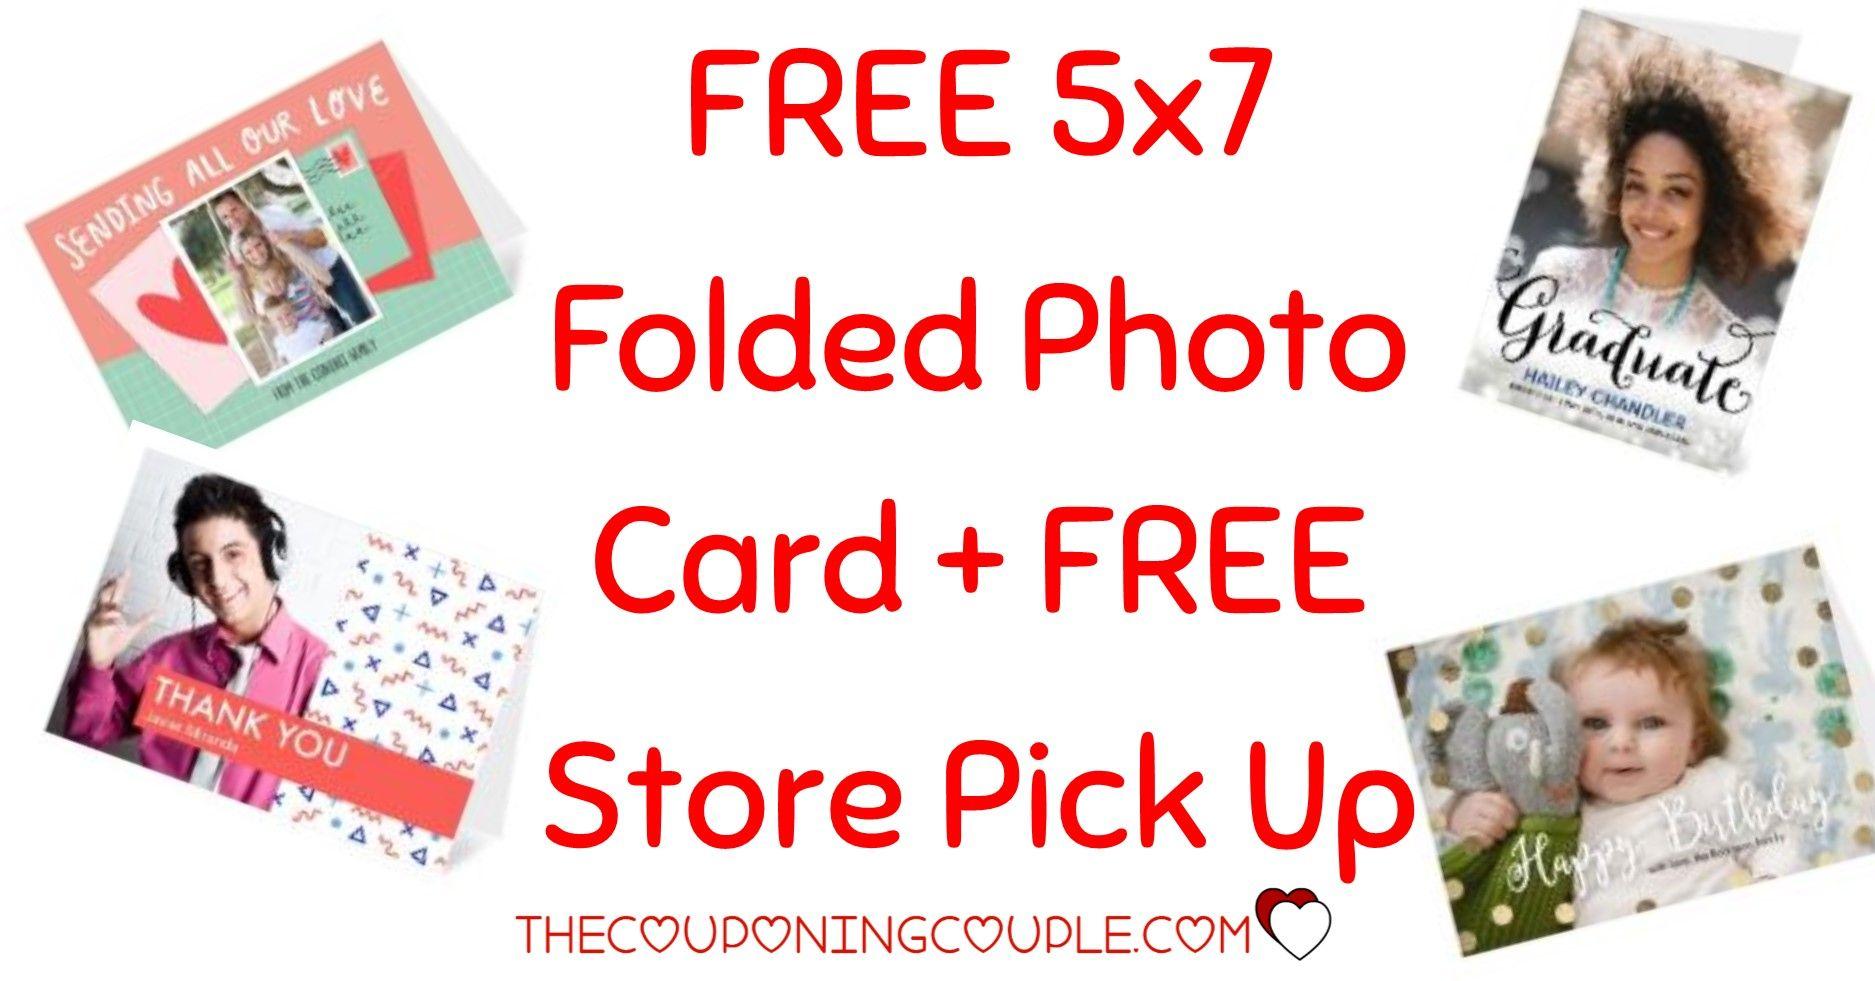 Free 5x7 folded photo card at cvs free pick up photo